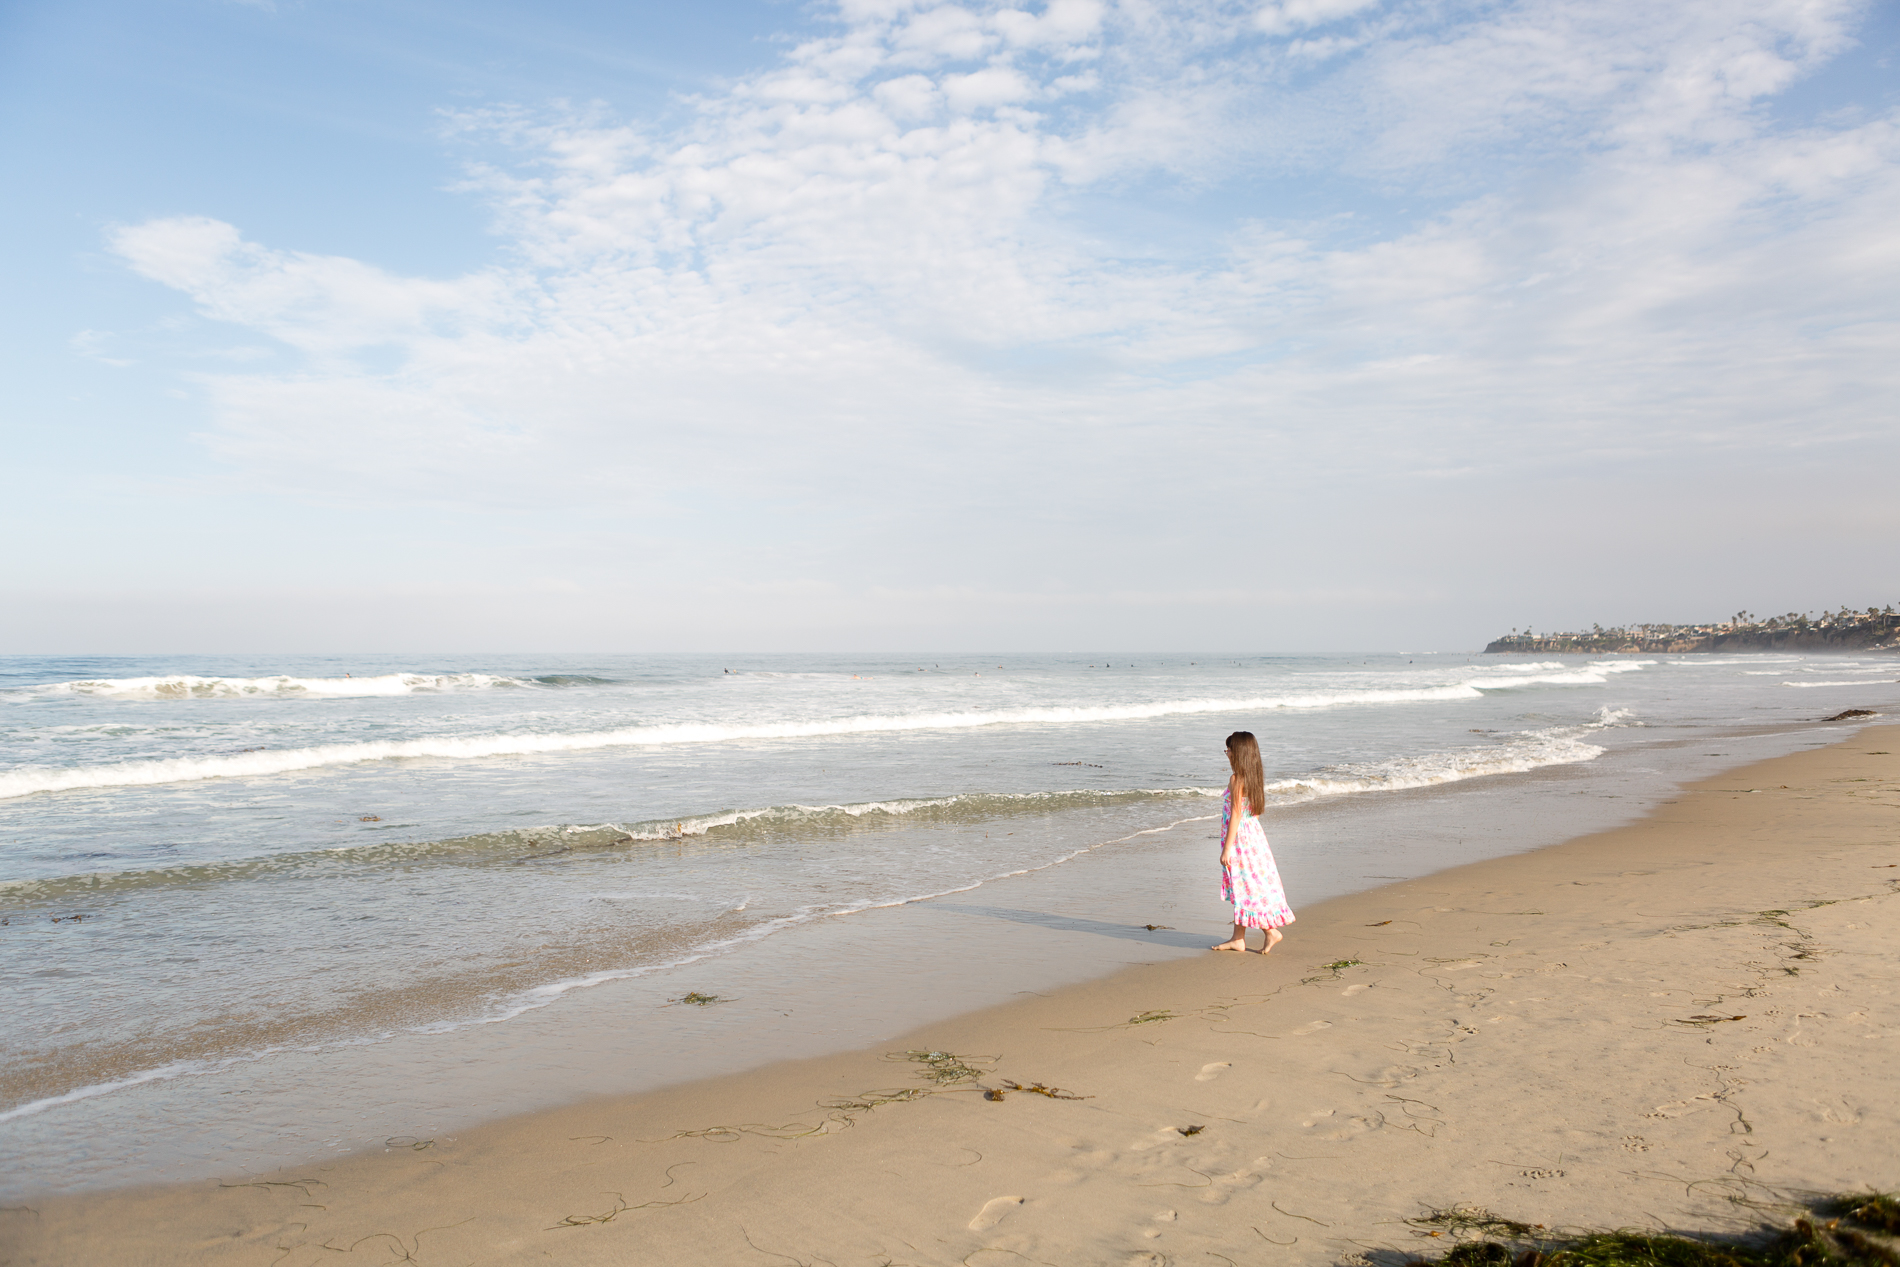 San.Diego.Family.Vacation.Photographer.Christine.Dammann.Photography.GFWS-4.jpg